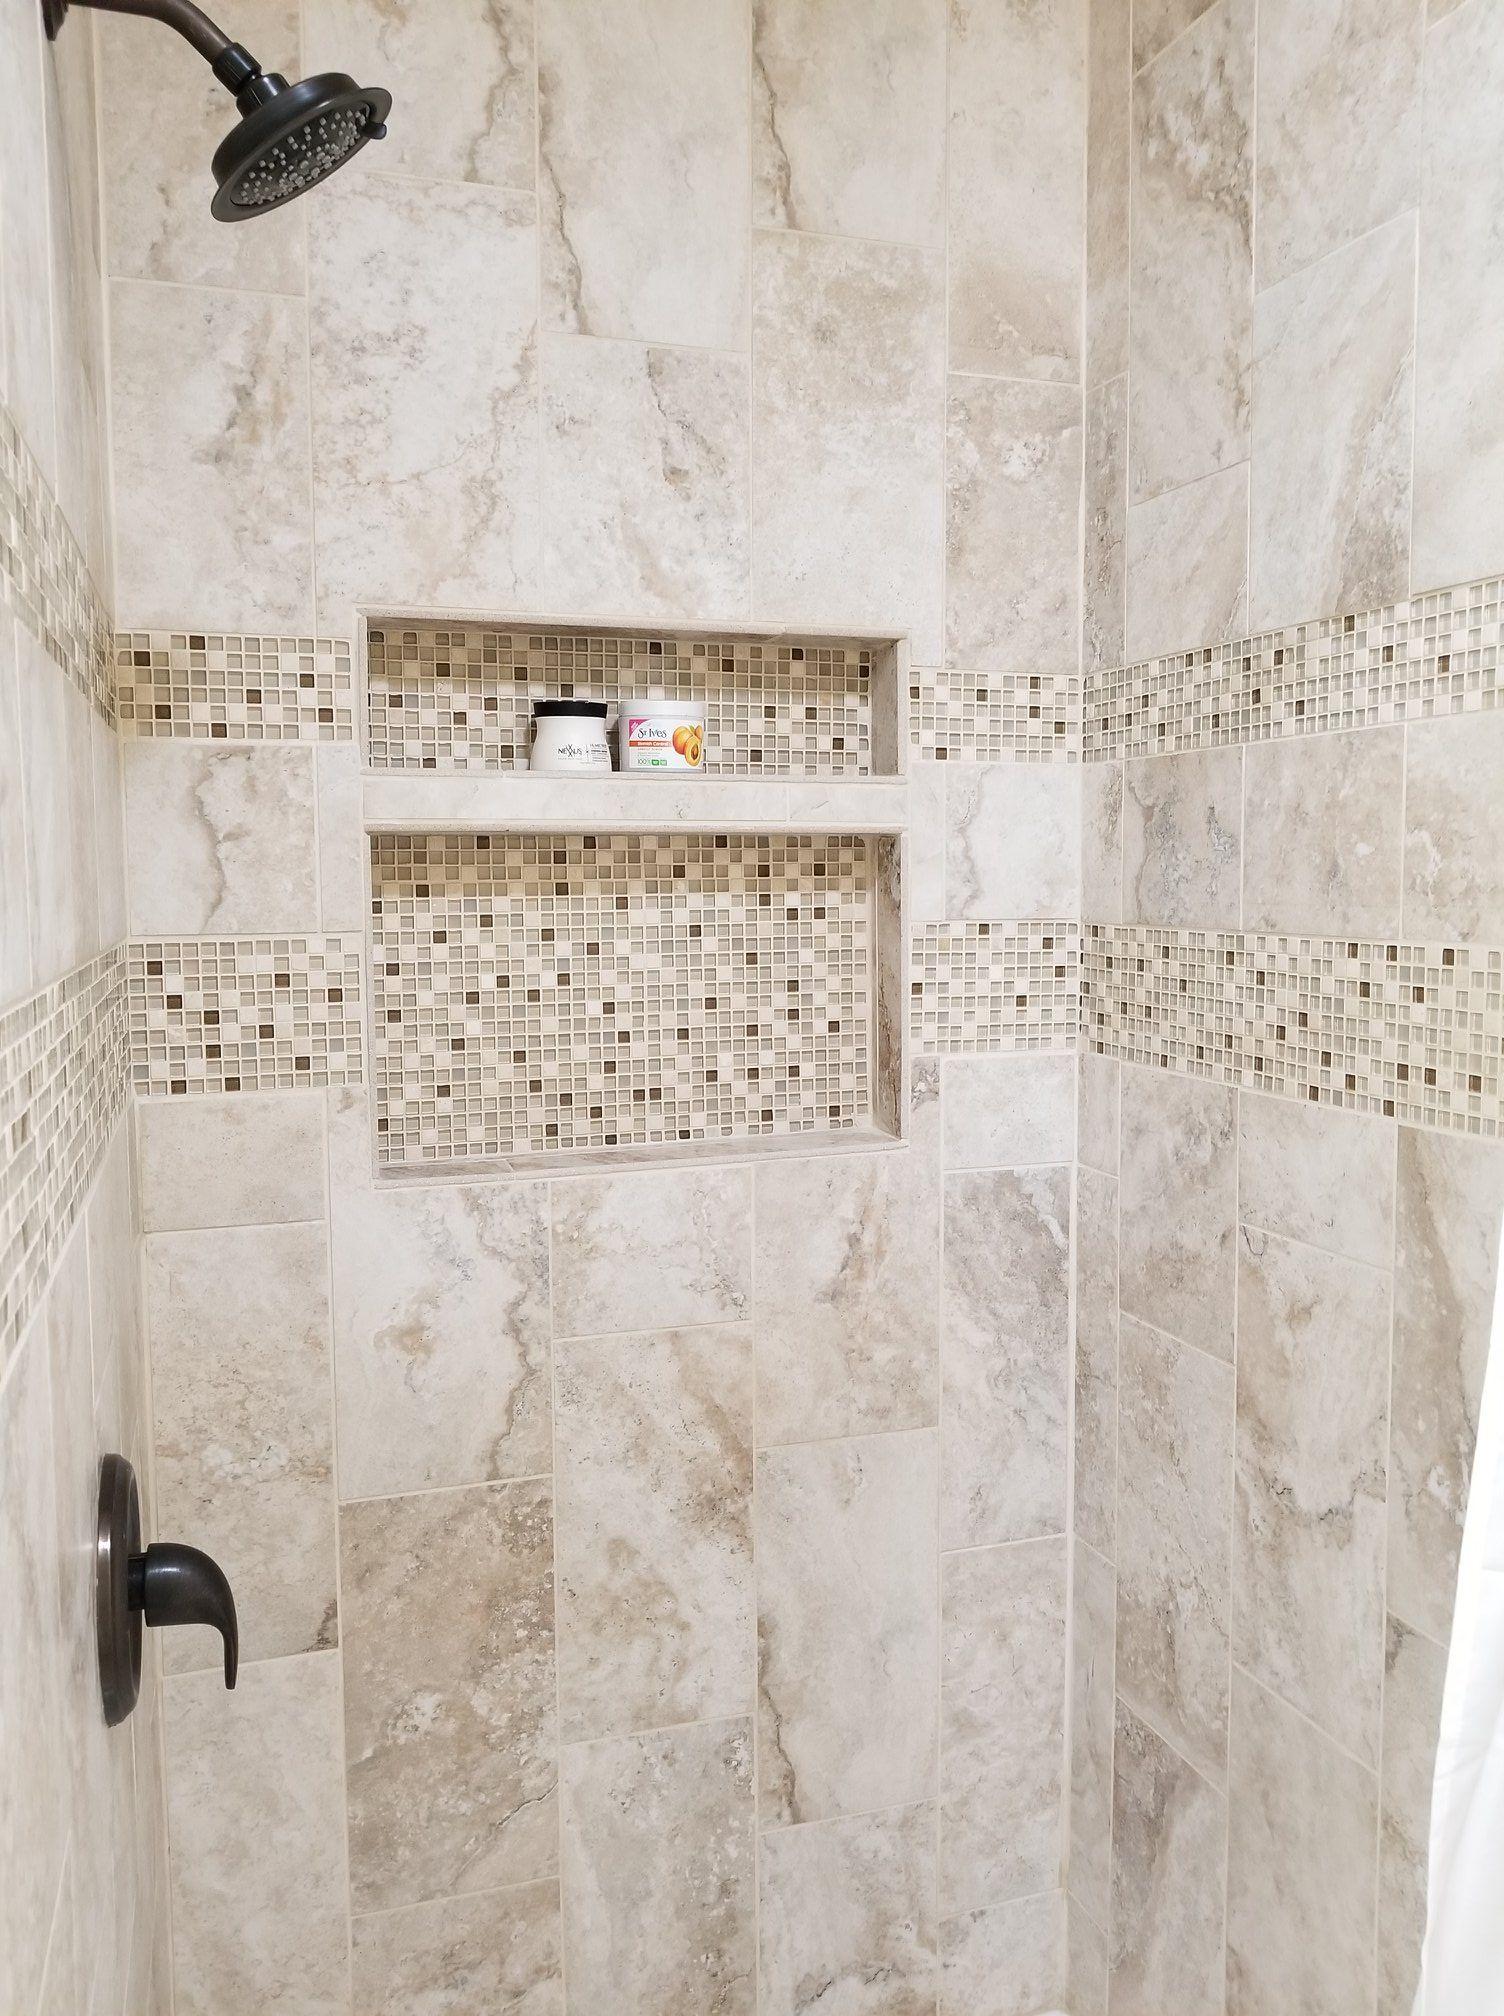 The Best Tile Showrooms In The U S Top Tile Showrooms In Every